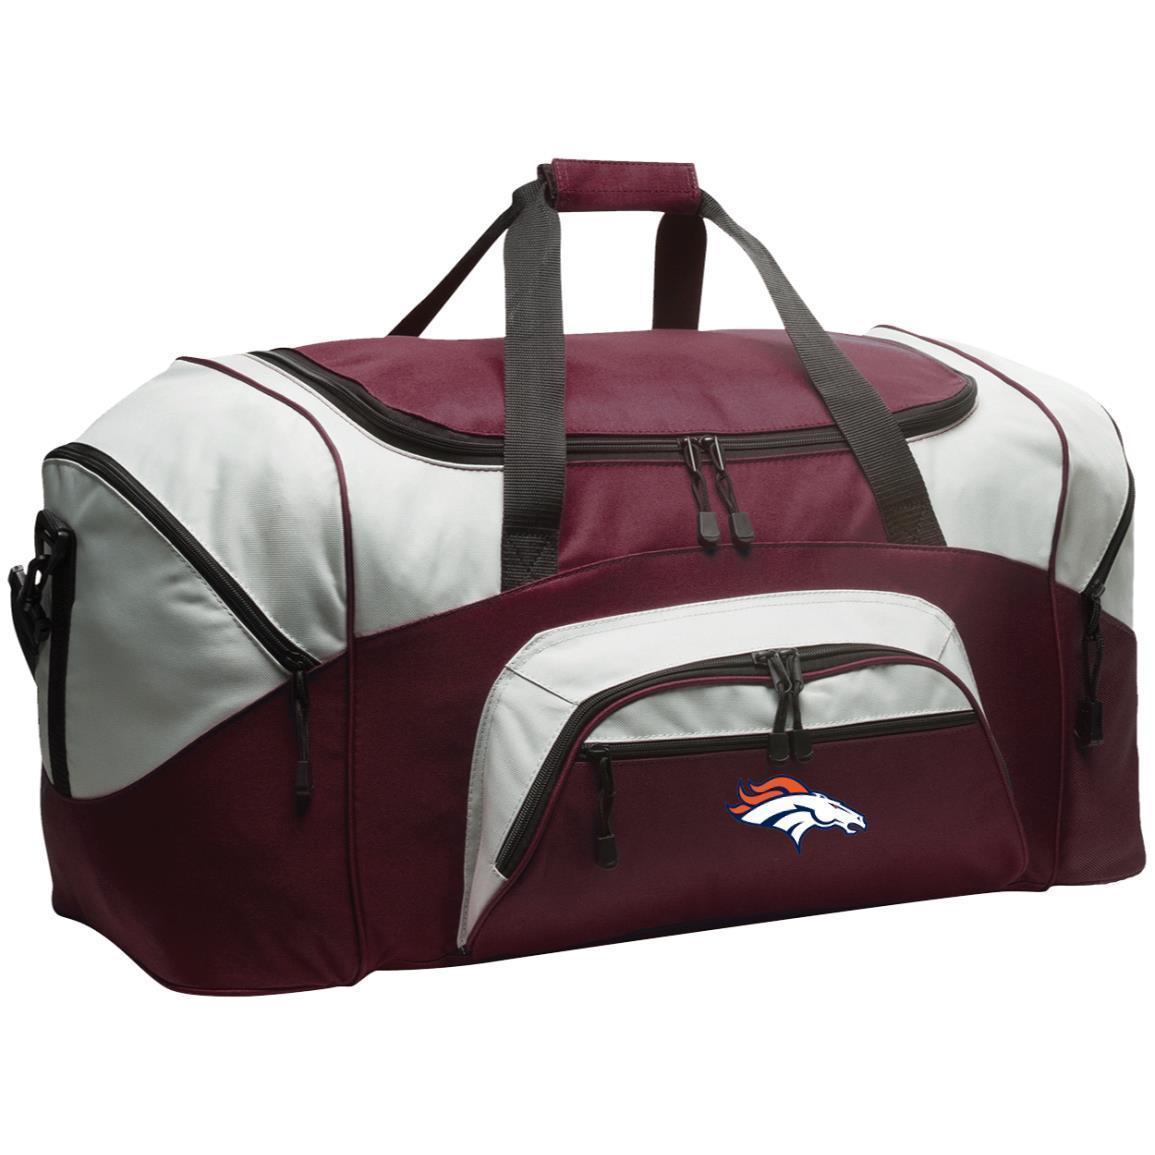 Denver Broncos Nfl Colorblock Sport Duffel Bag